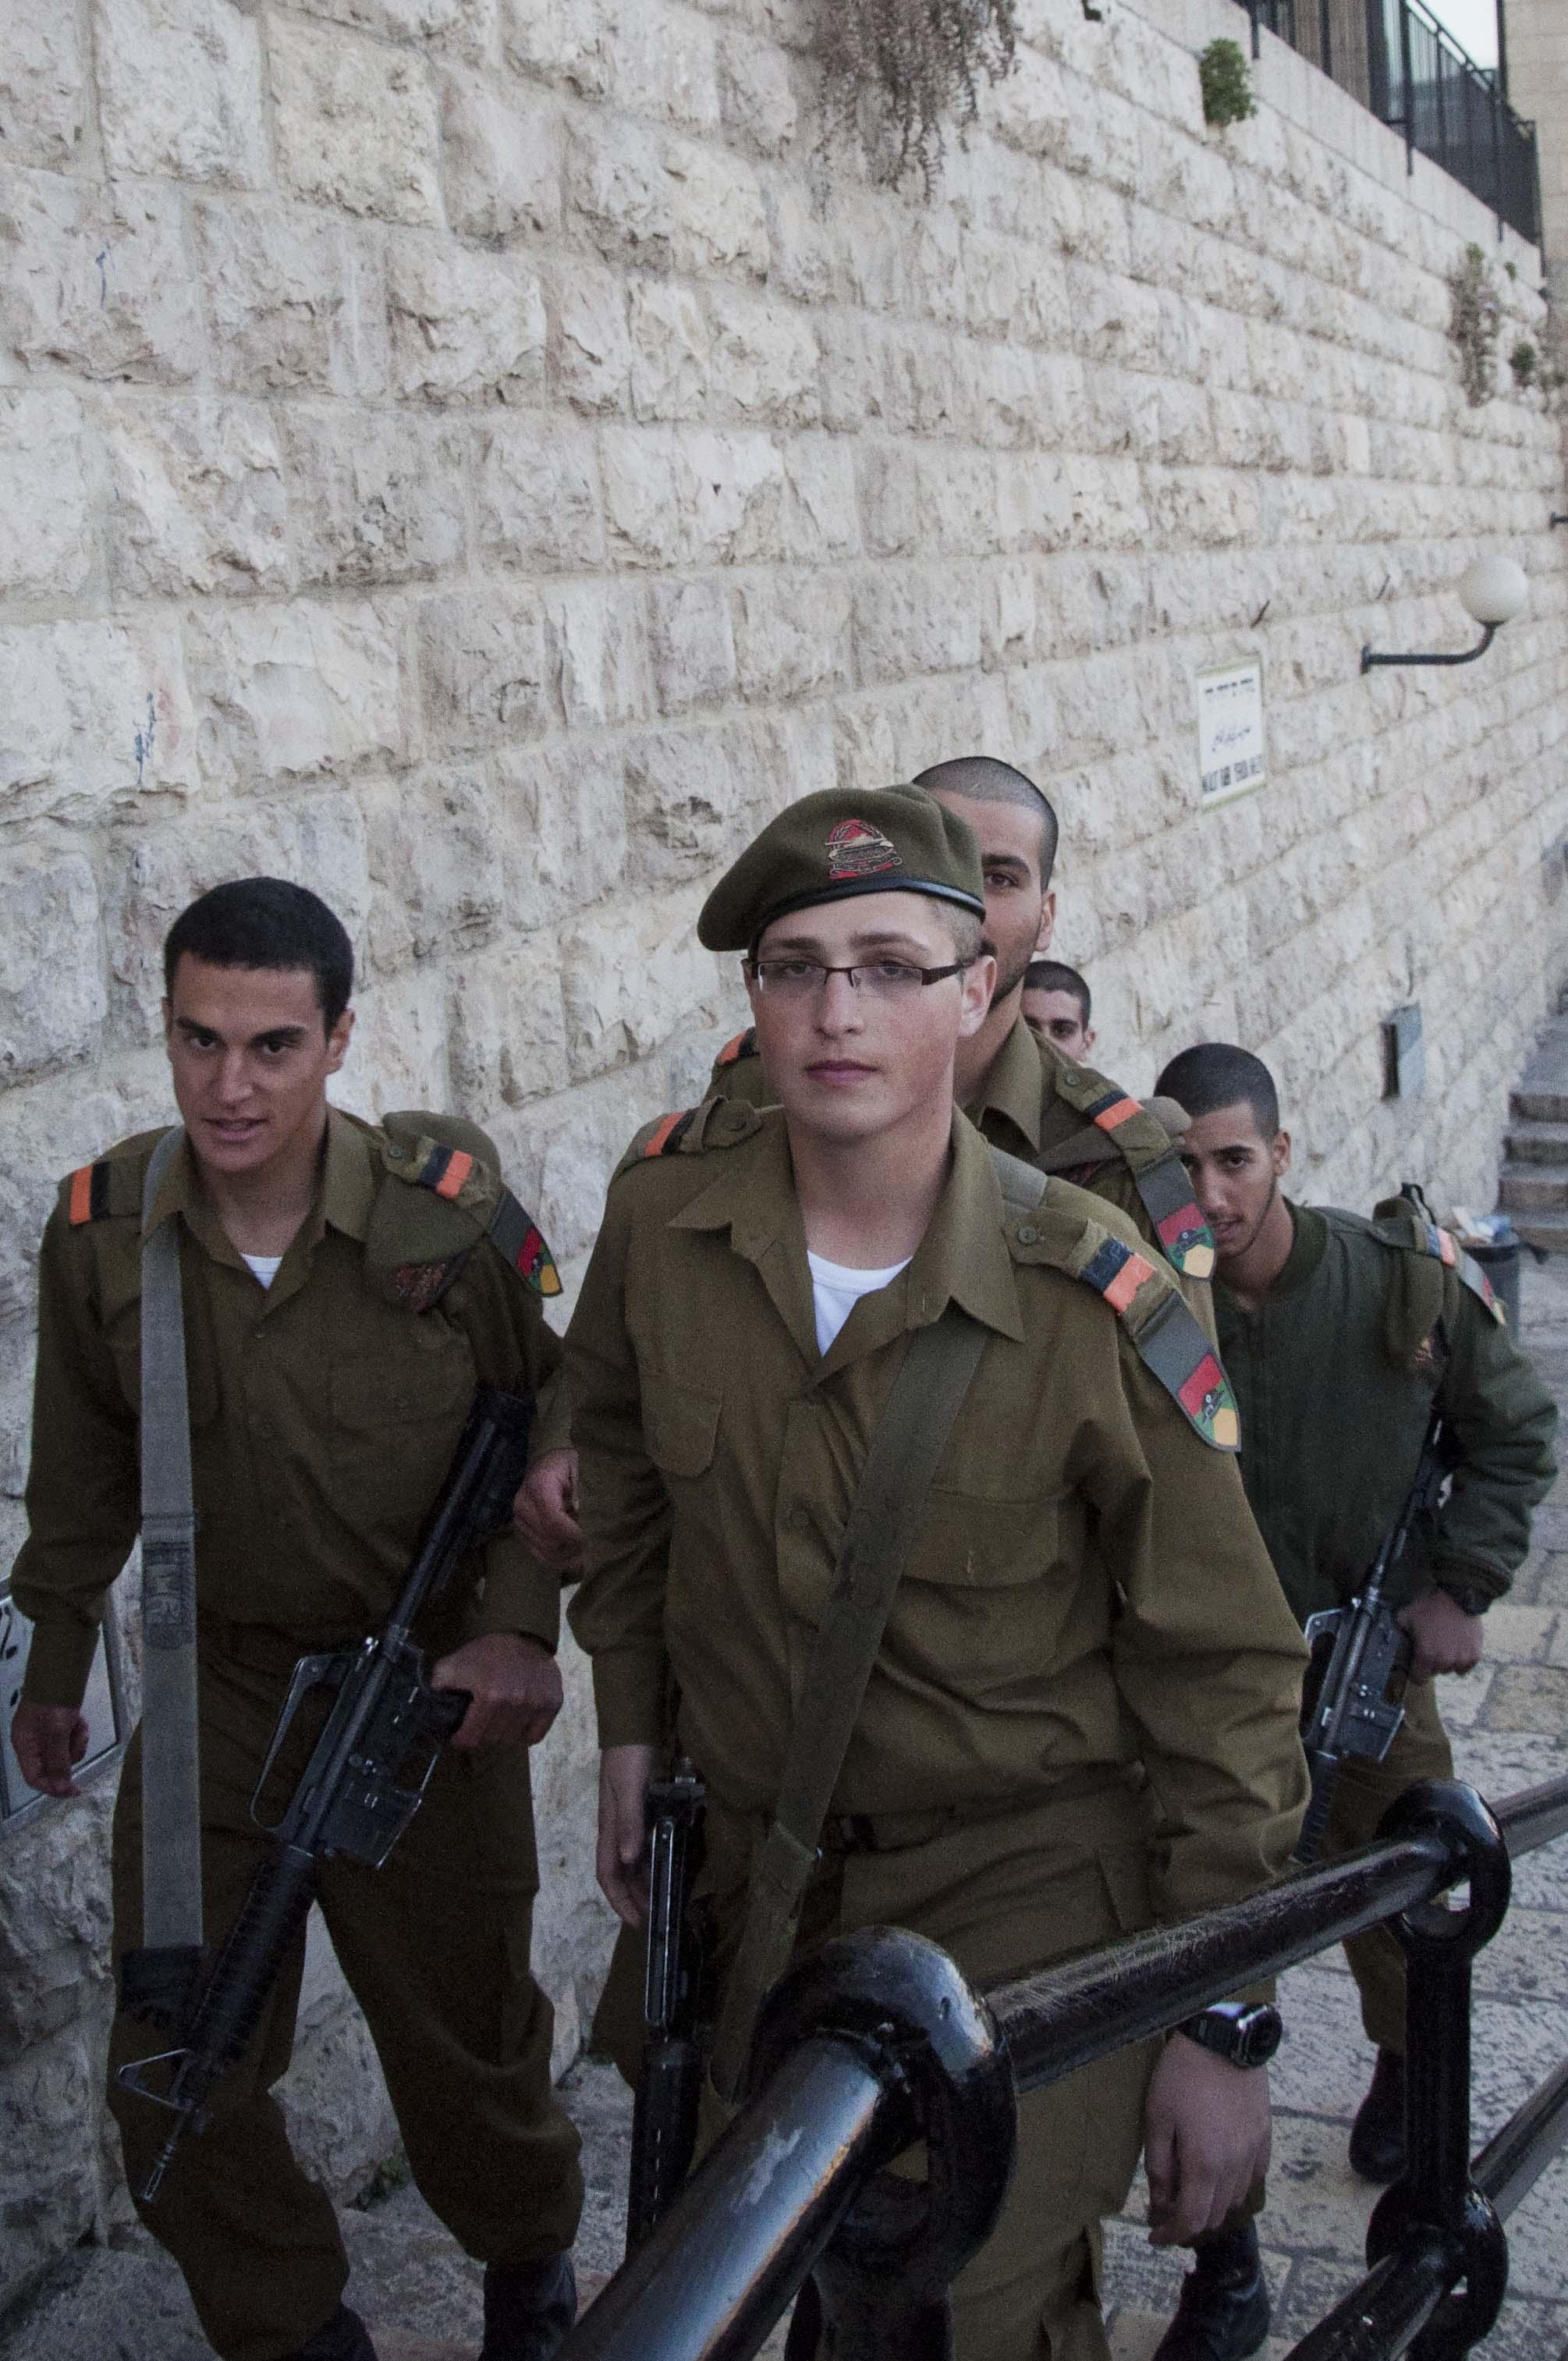 soldiersface.jpg